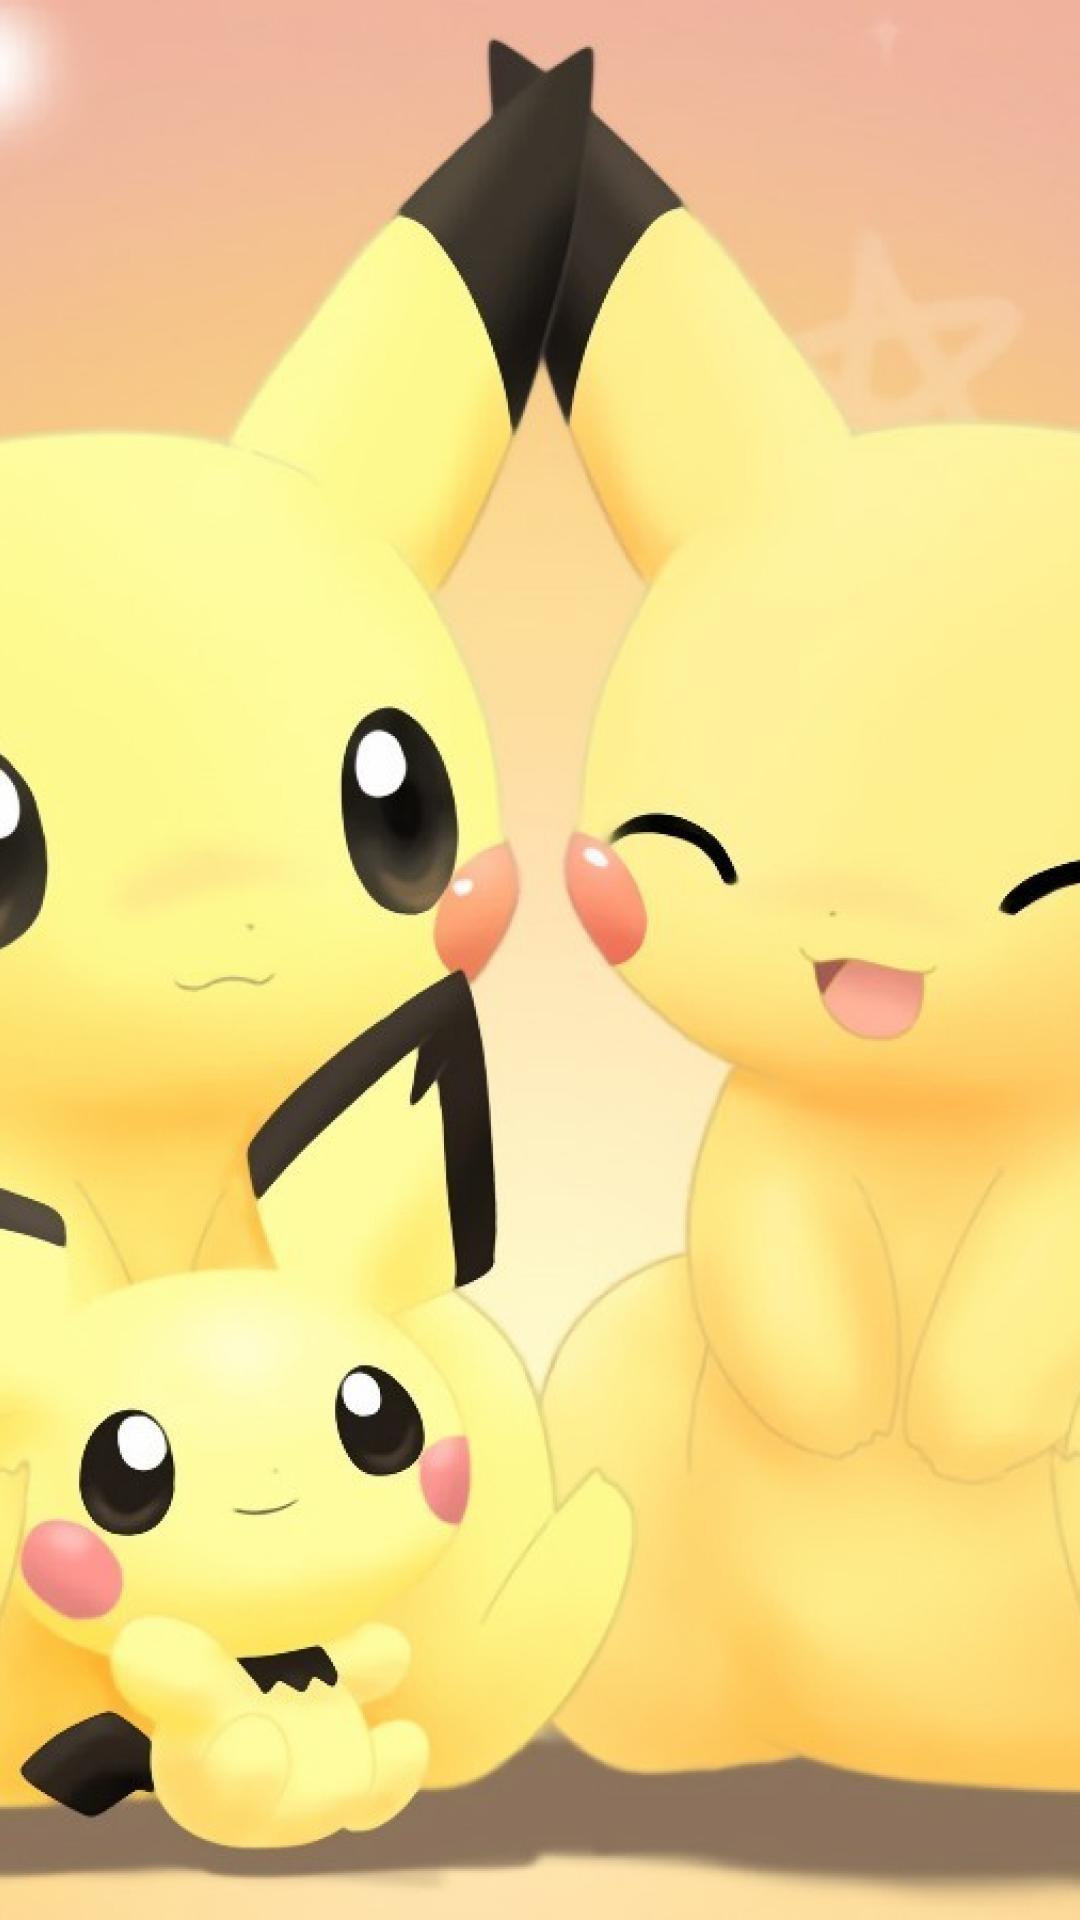 Pokemon cute Pikachu girly love iphone 6 plus wallpaper.